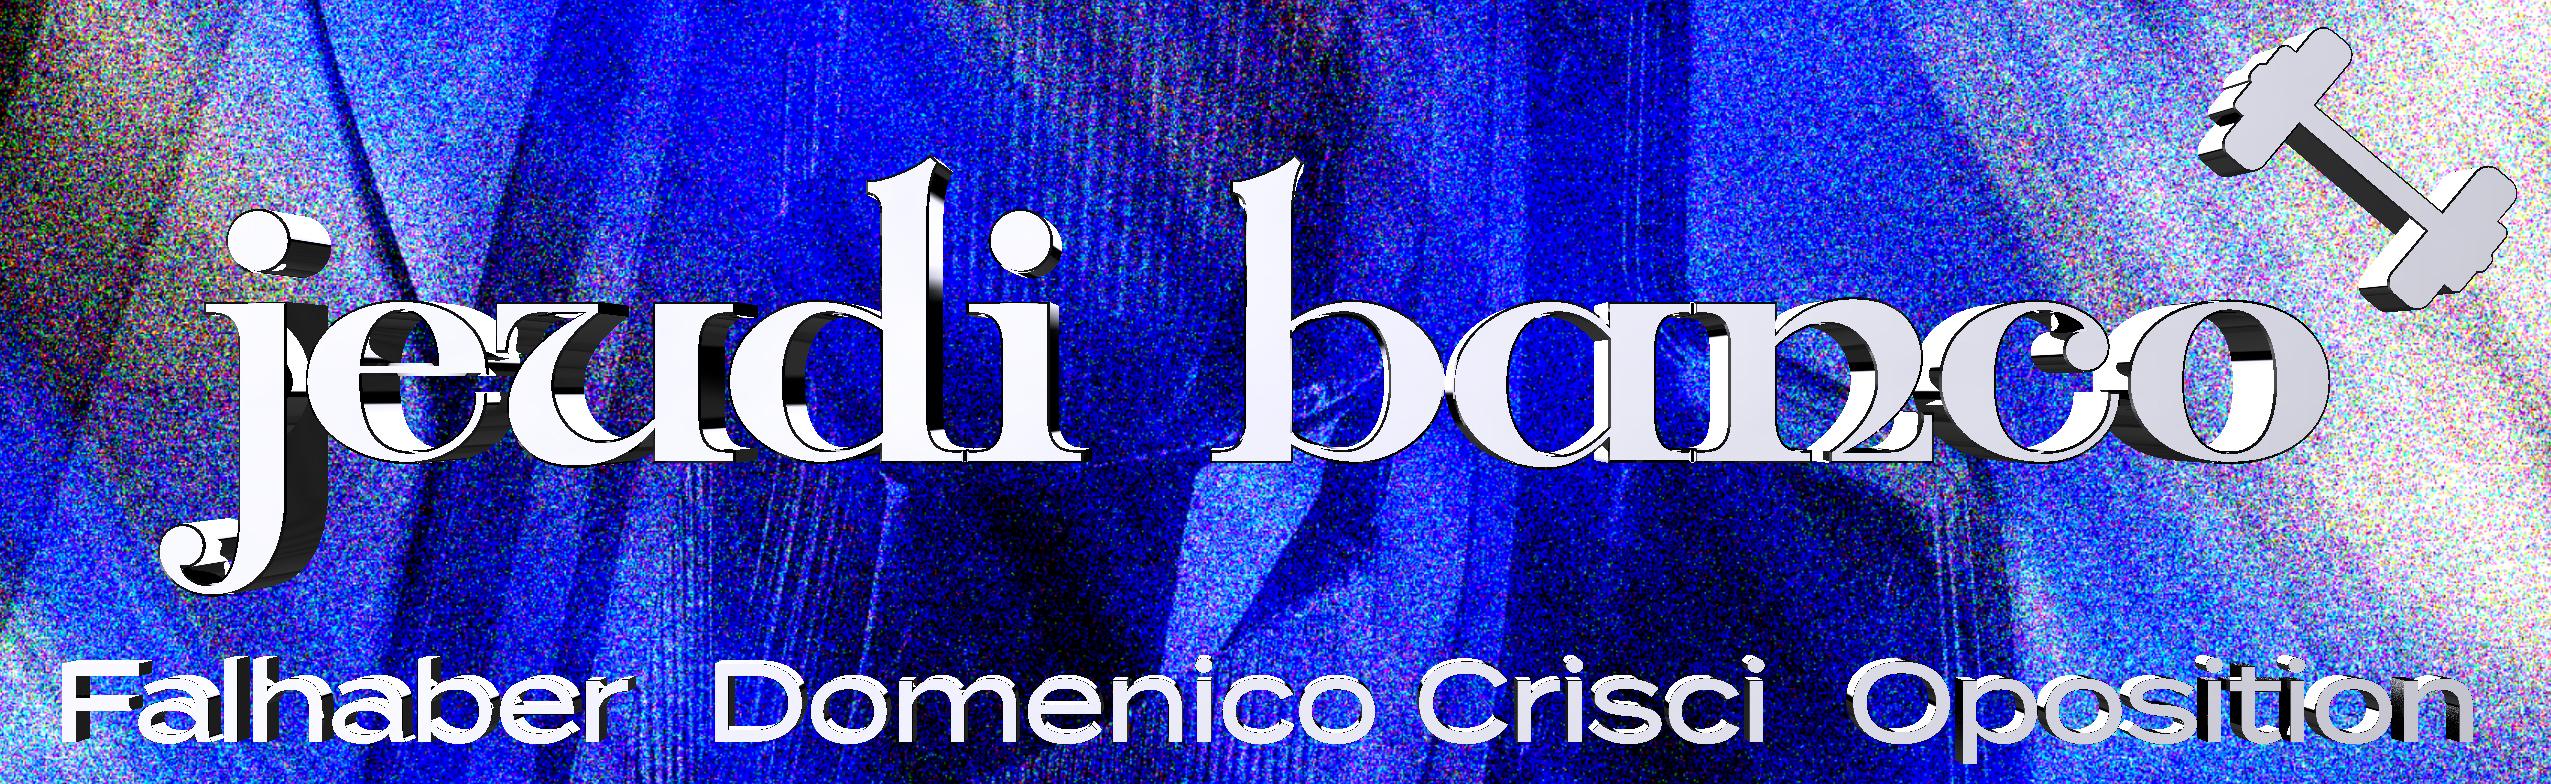 Jeudi Banco : Domenico Crisci • Falhaber • Oposition